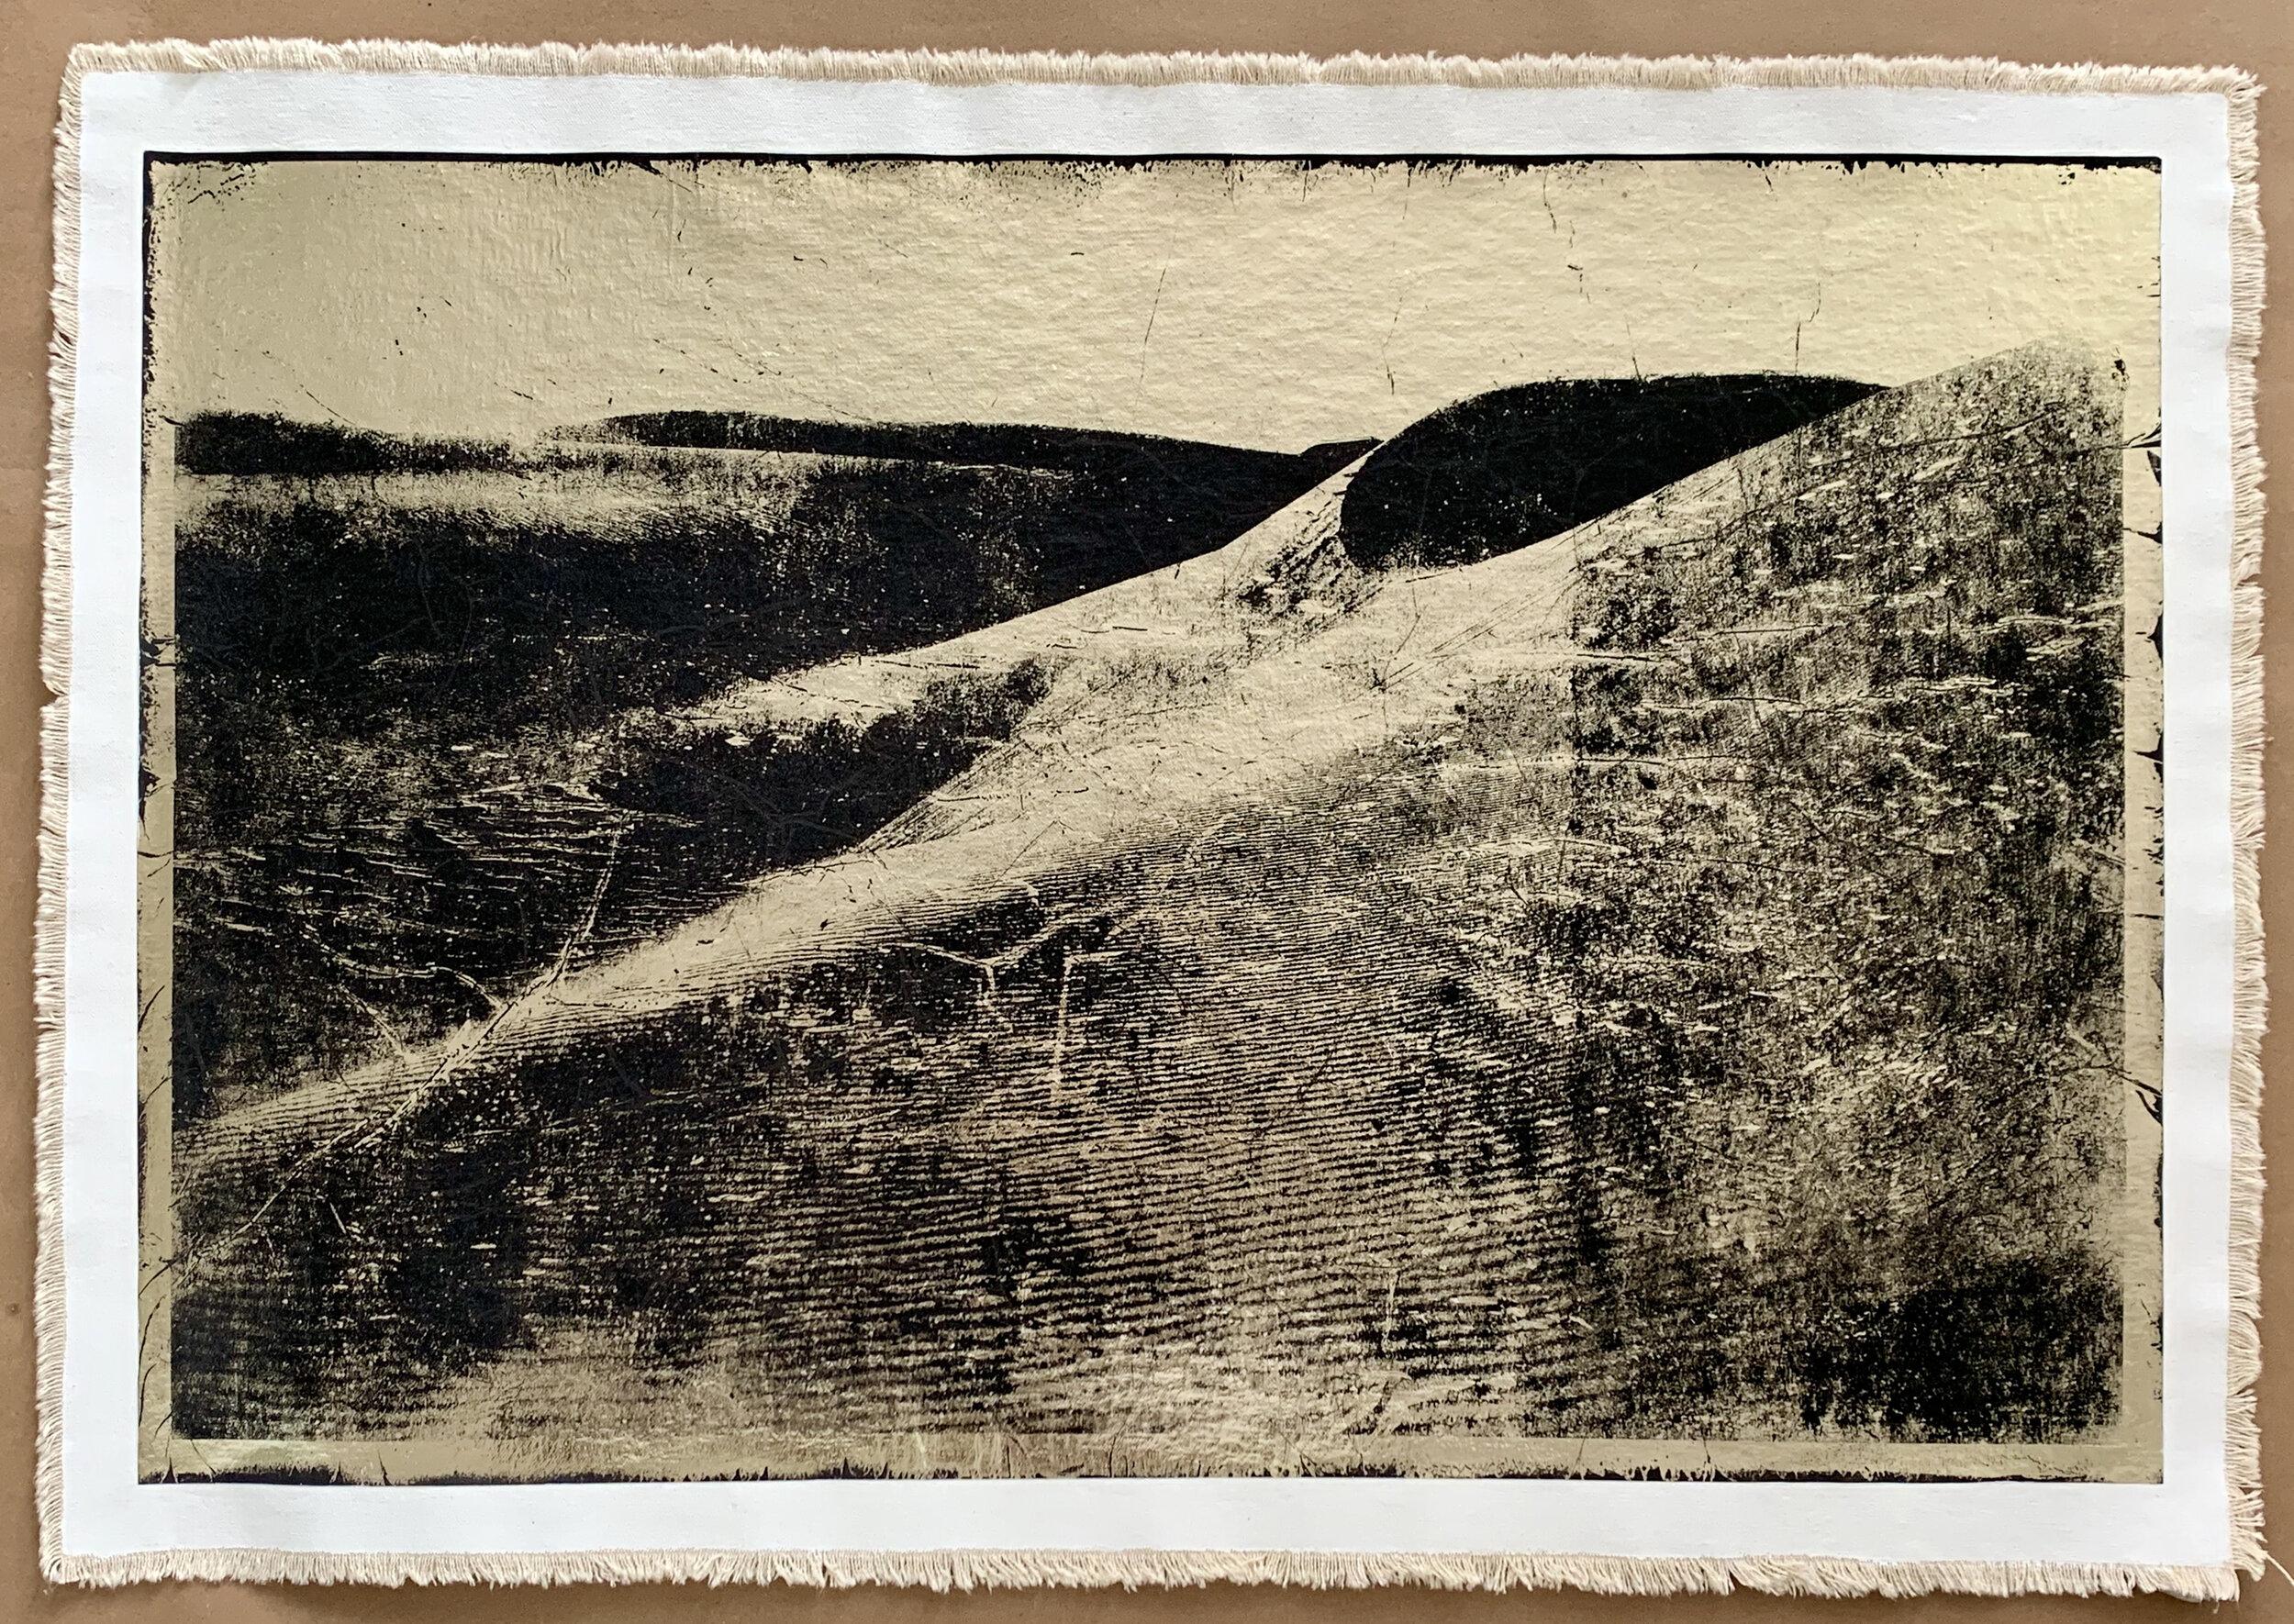 Egyptian Dunes III, negative version